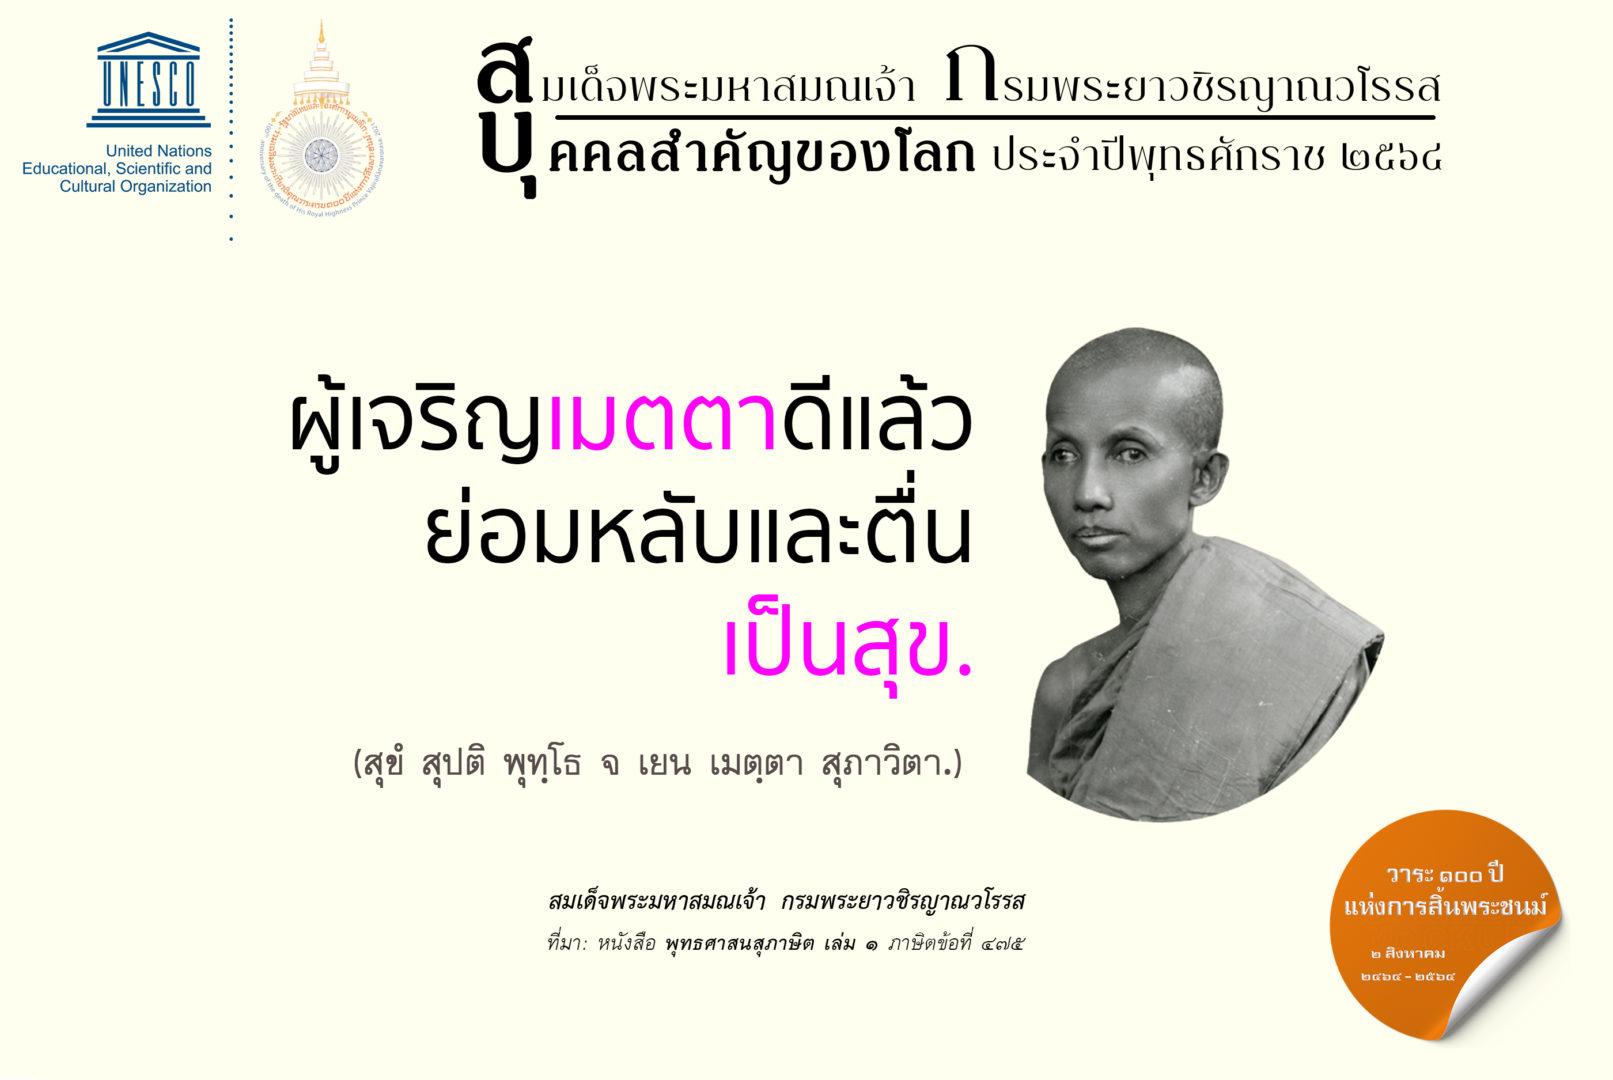 Th Mahasamana Quote 010